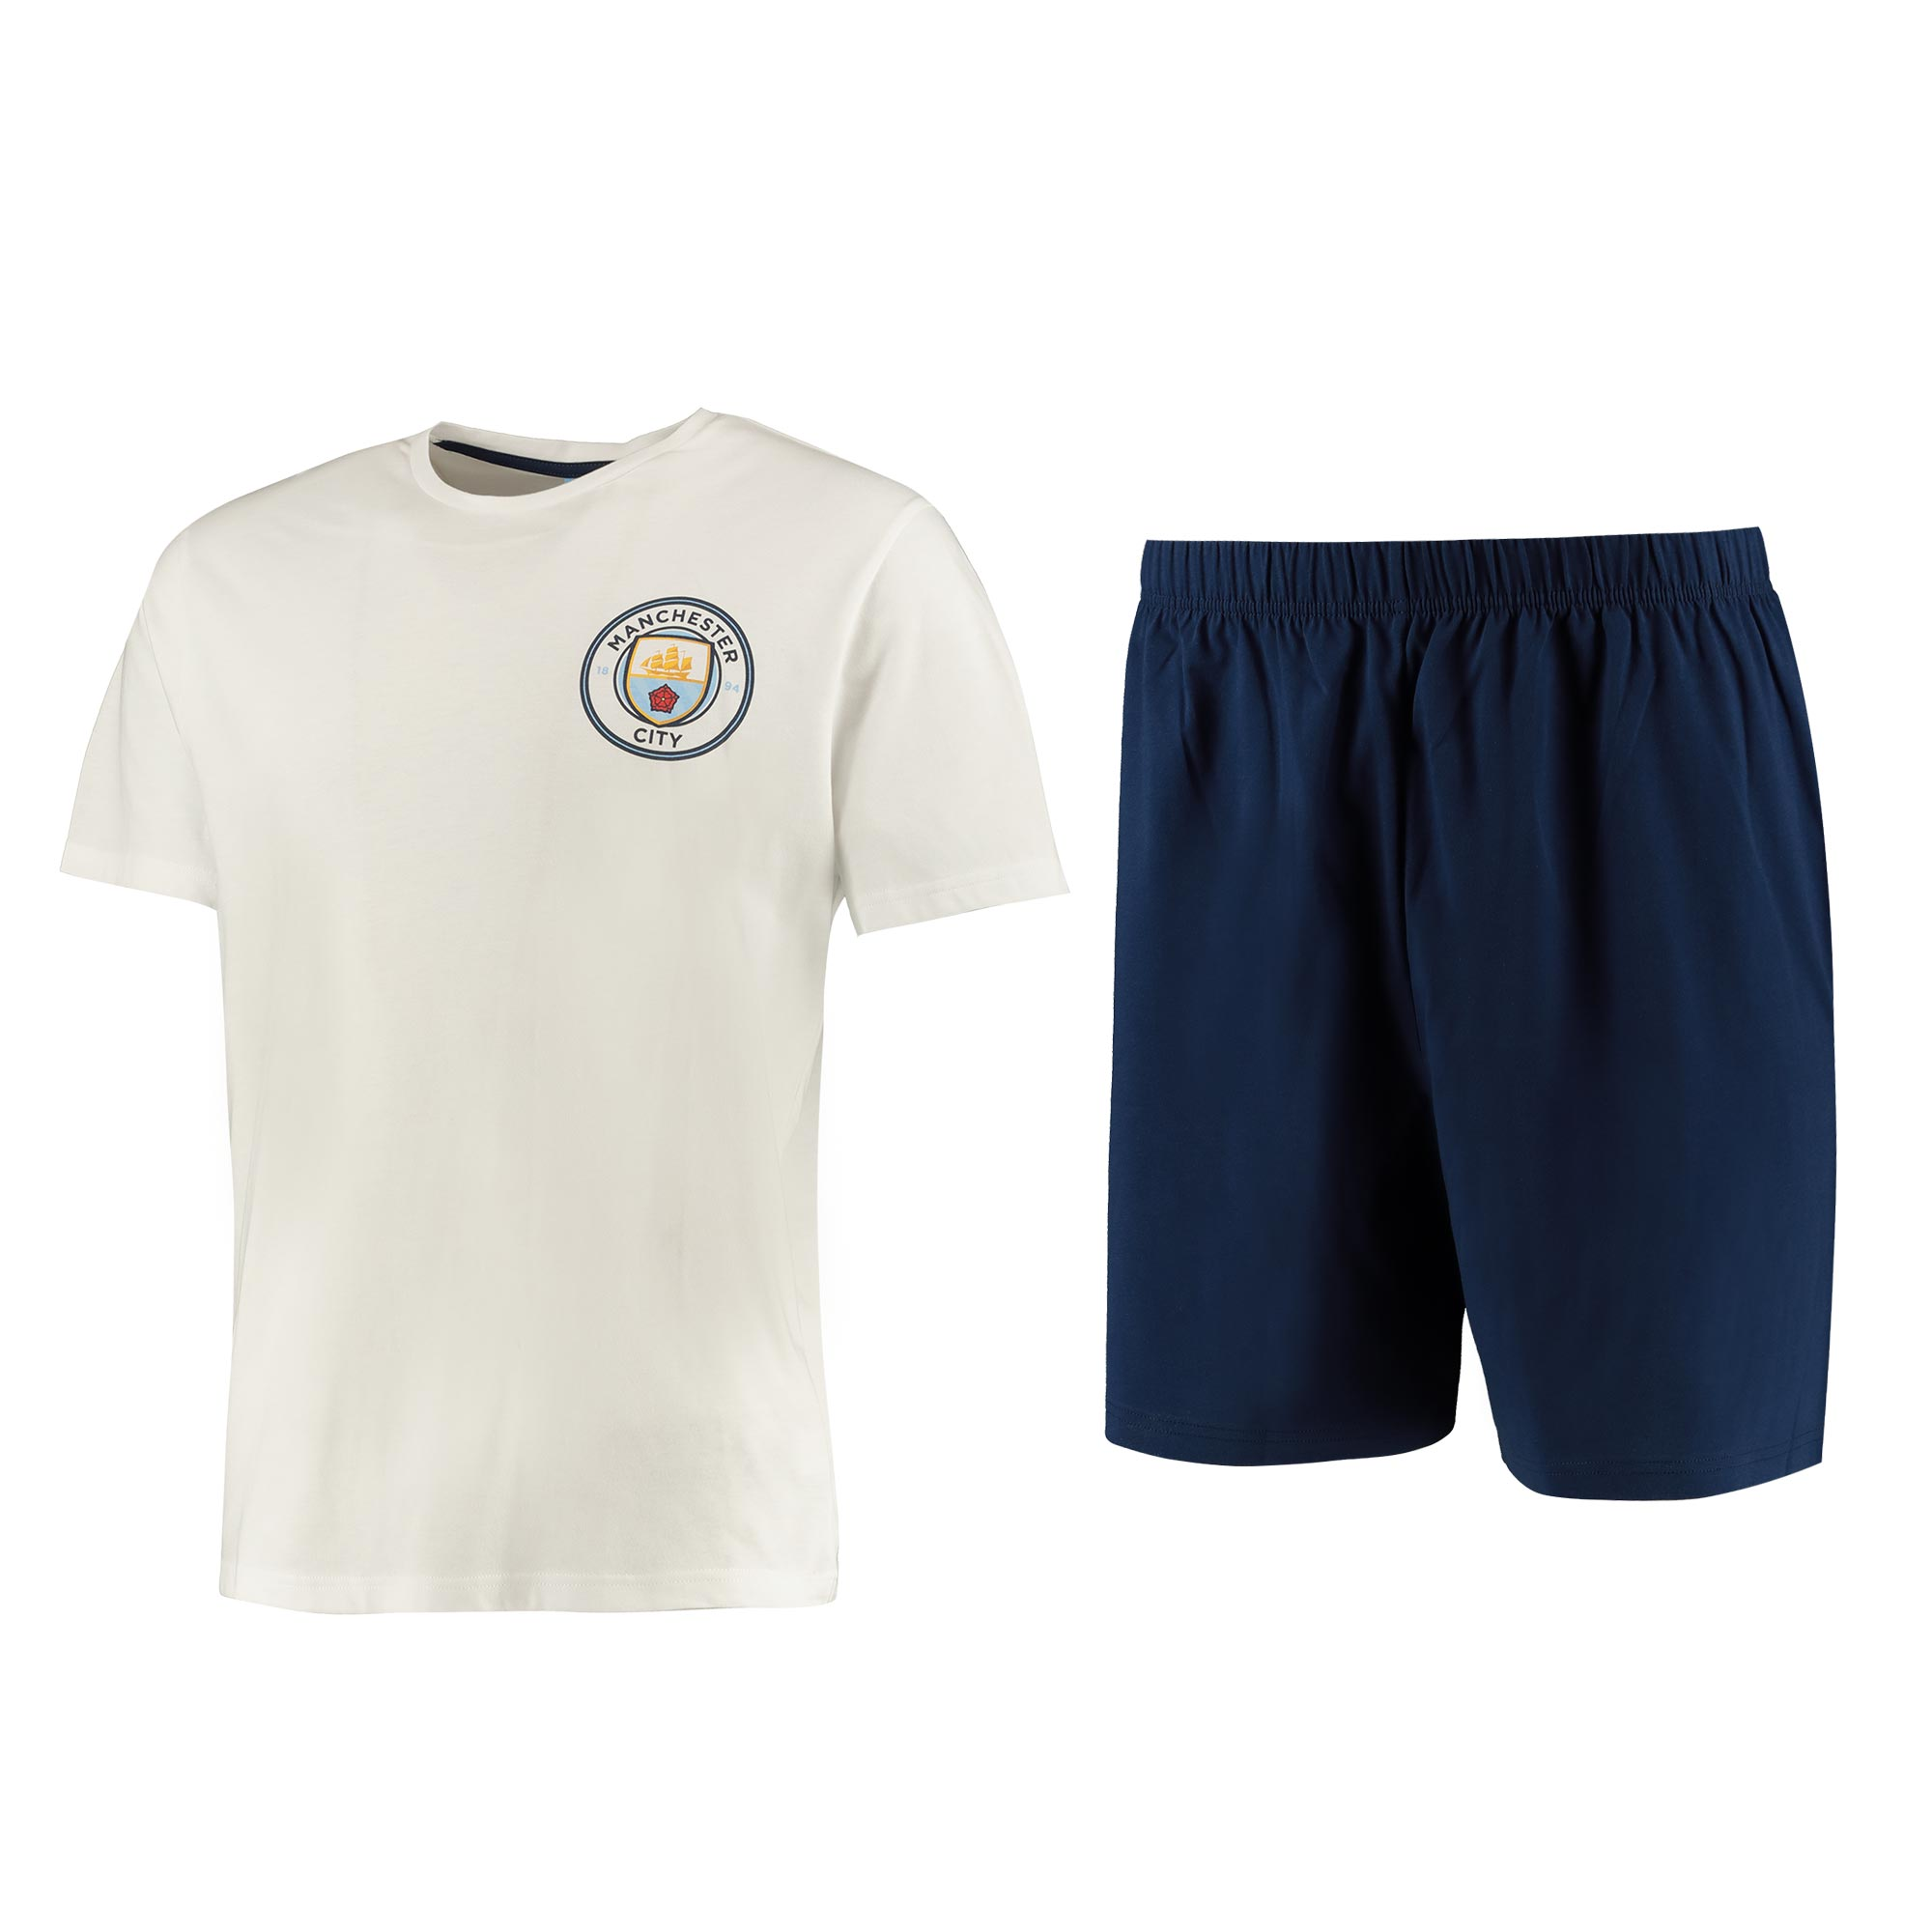 Manchester City T-Shirt and Shorts Pyjama Set - White/Navy - Mens